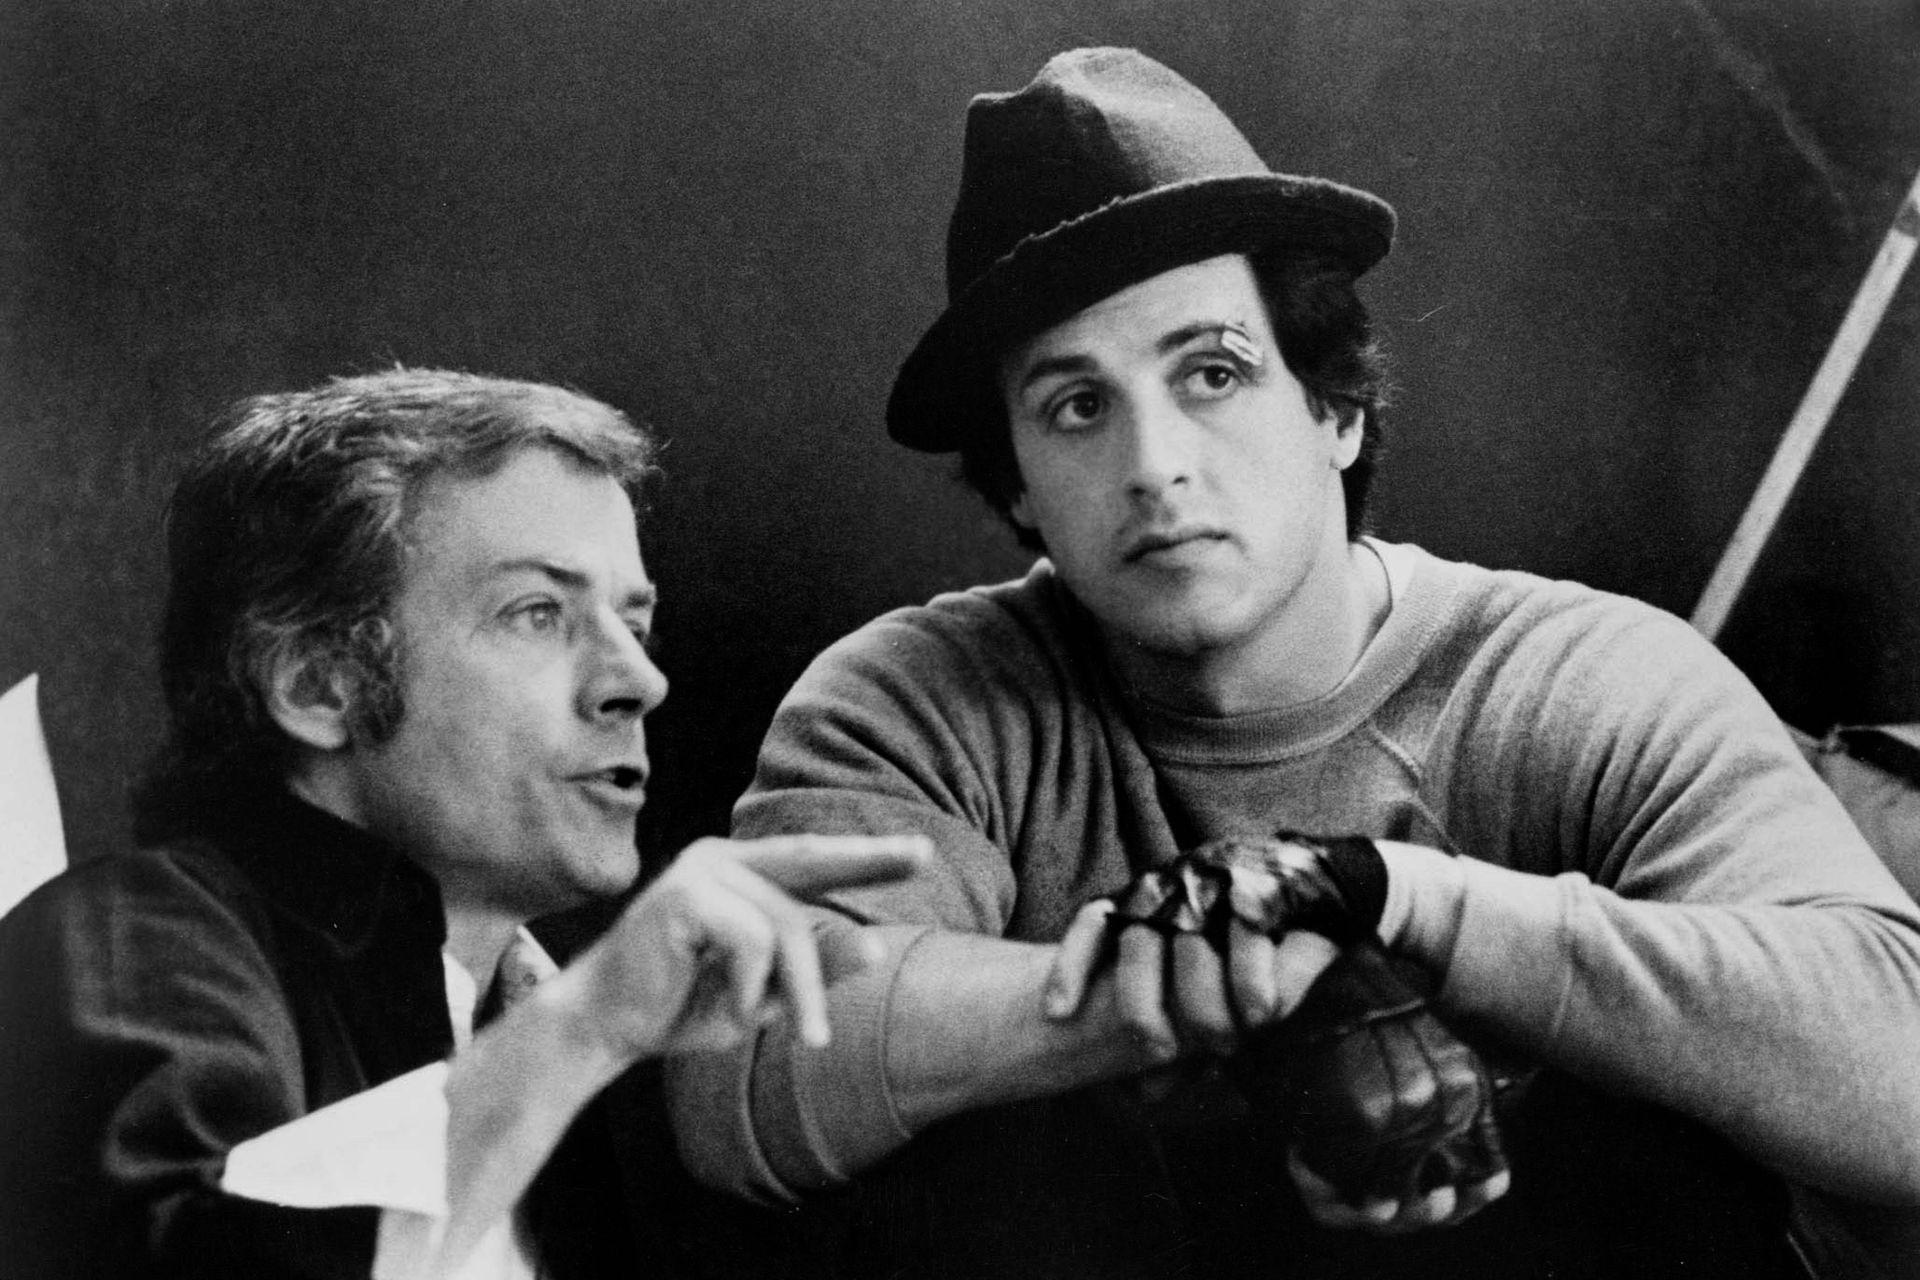 John Avildsen y Sylvester Stallone, en 1976